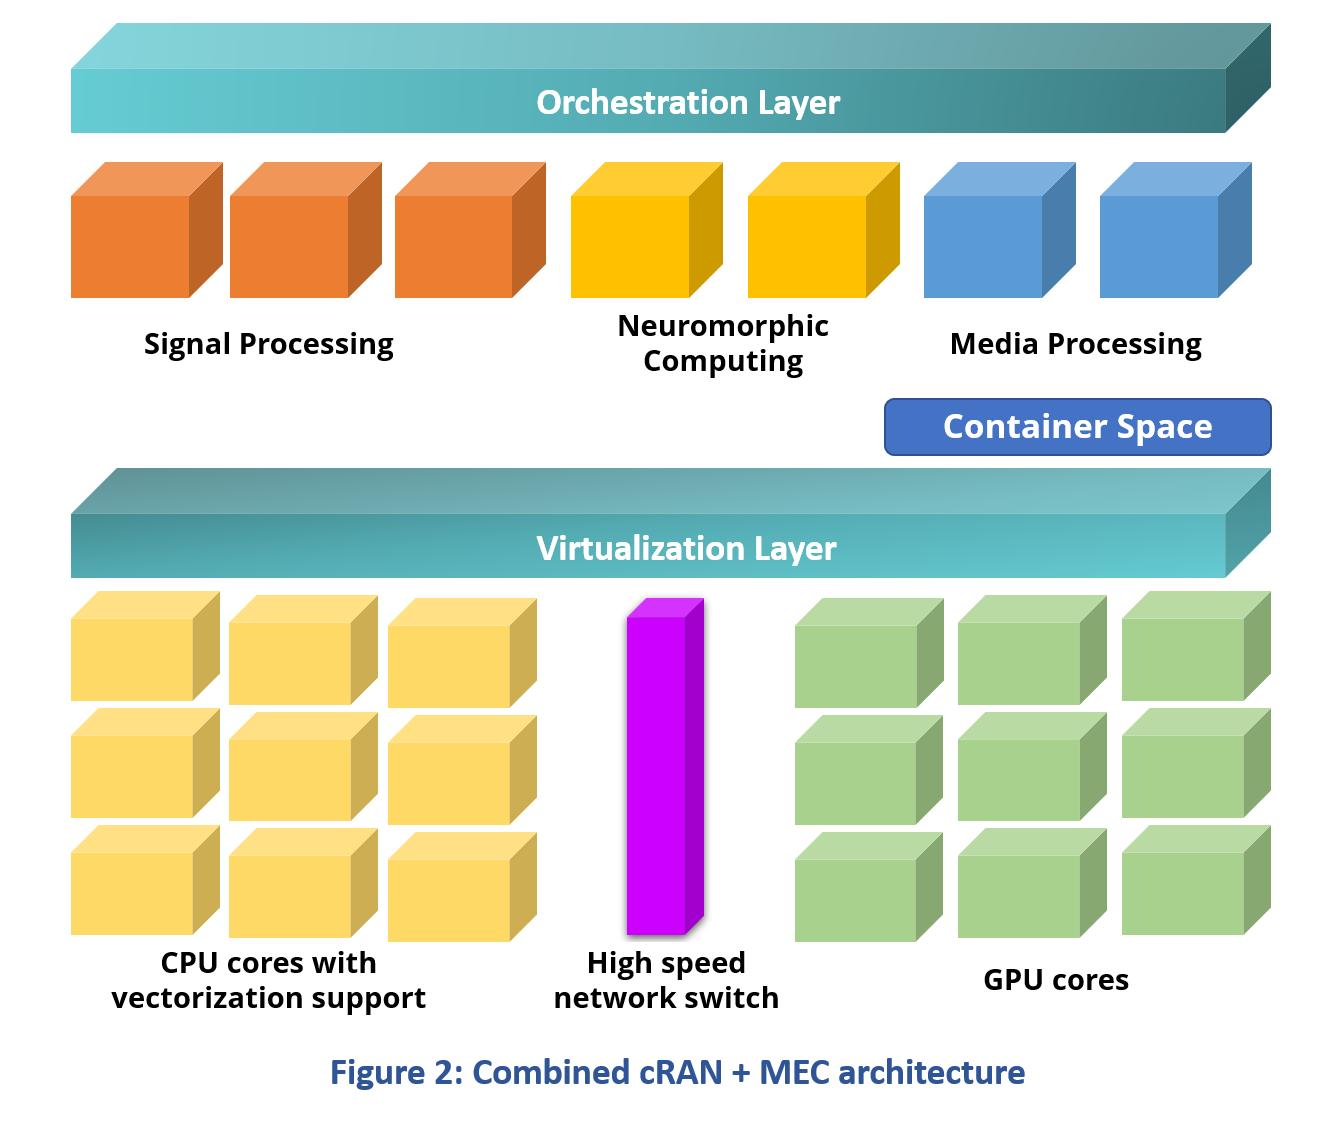 Combined cRAN + MEC Architecture